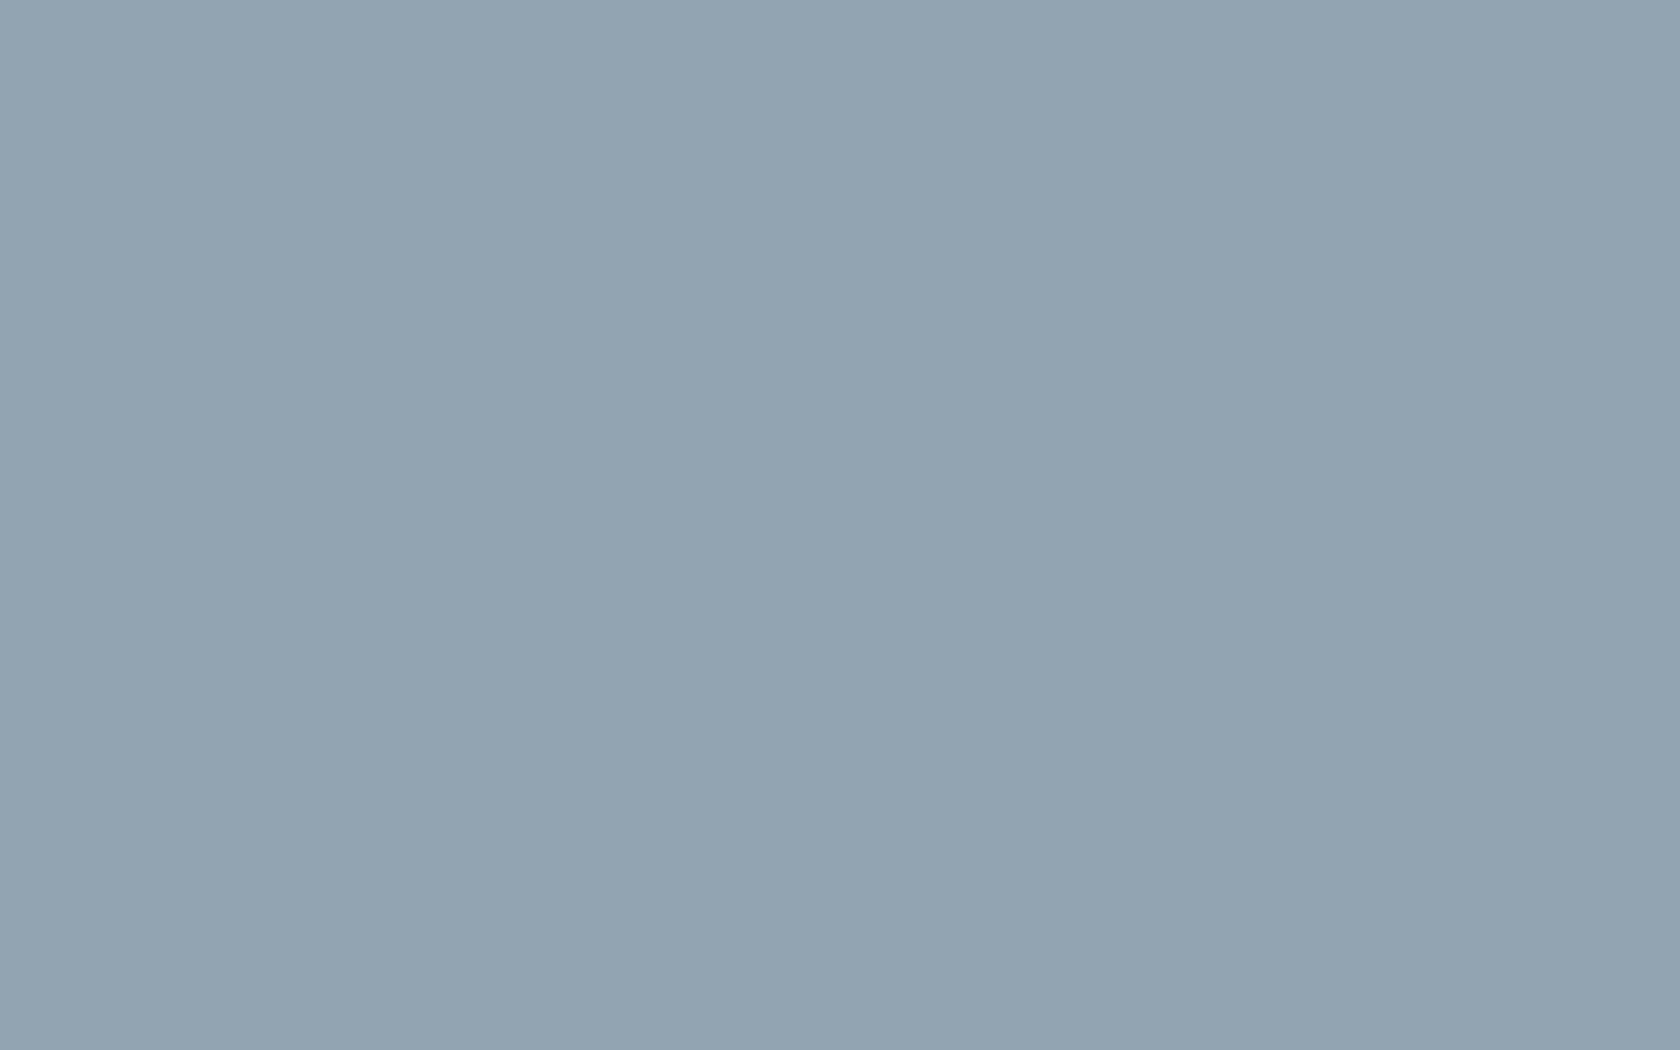 1680x1050 Cadet Grey Solid Color Background